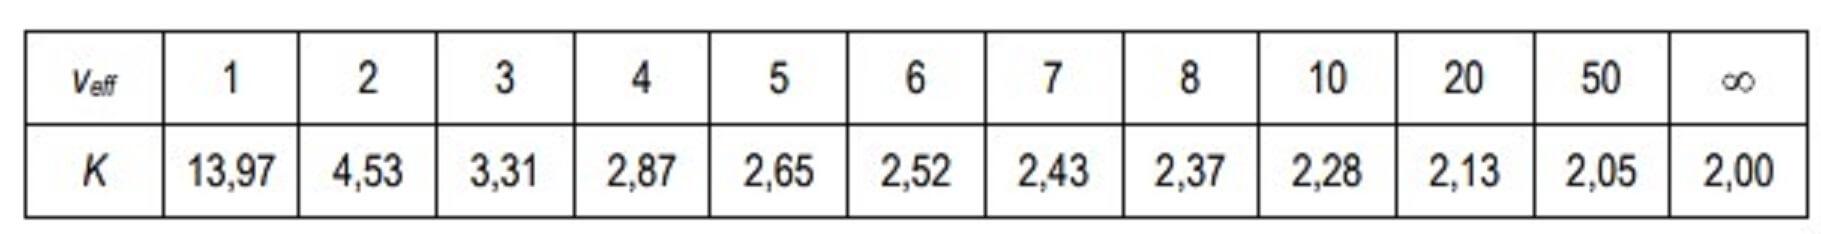 Tabela t-student.